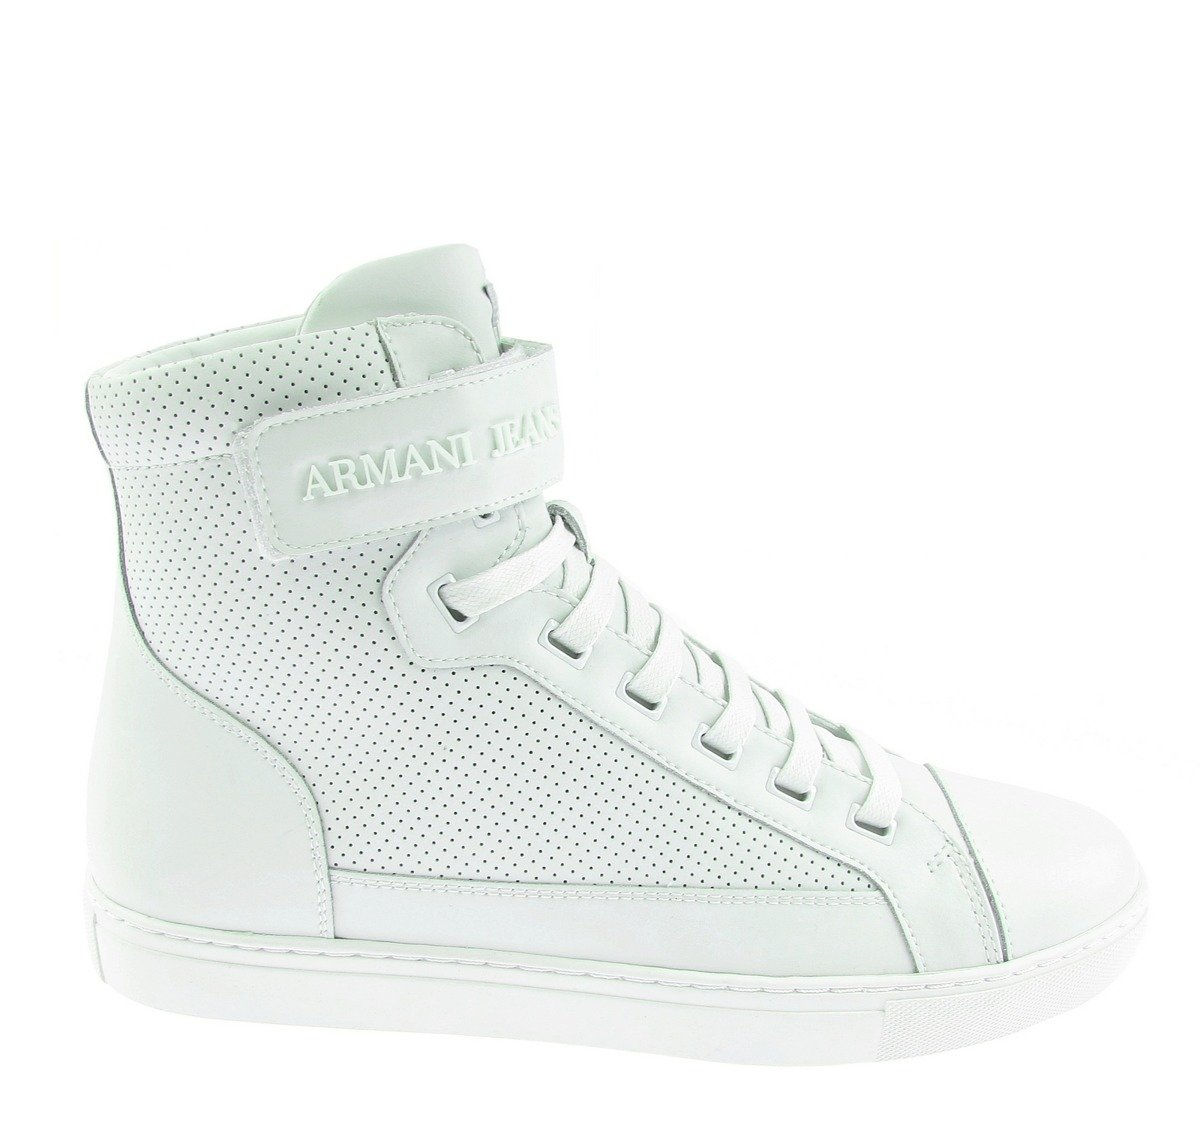 bcbcb8a6a53c63 ARMANI JEANS 935042 Herren Men Hi-Top Sneakers Schuhe Shoes Weiß White Leder  Click to zoom ...